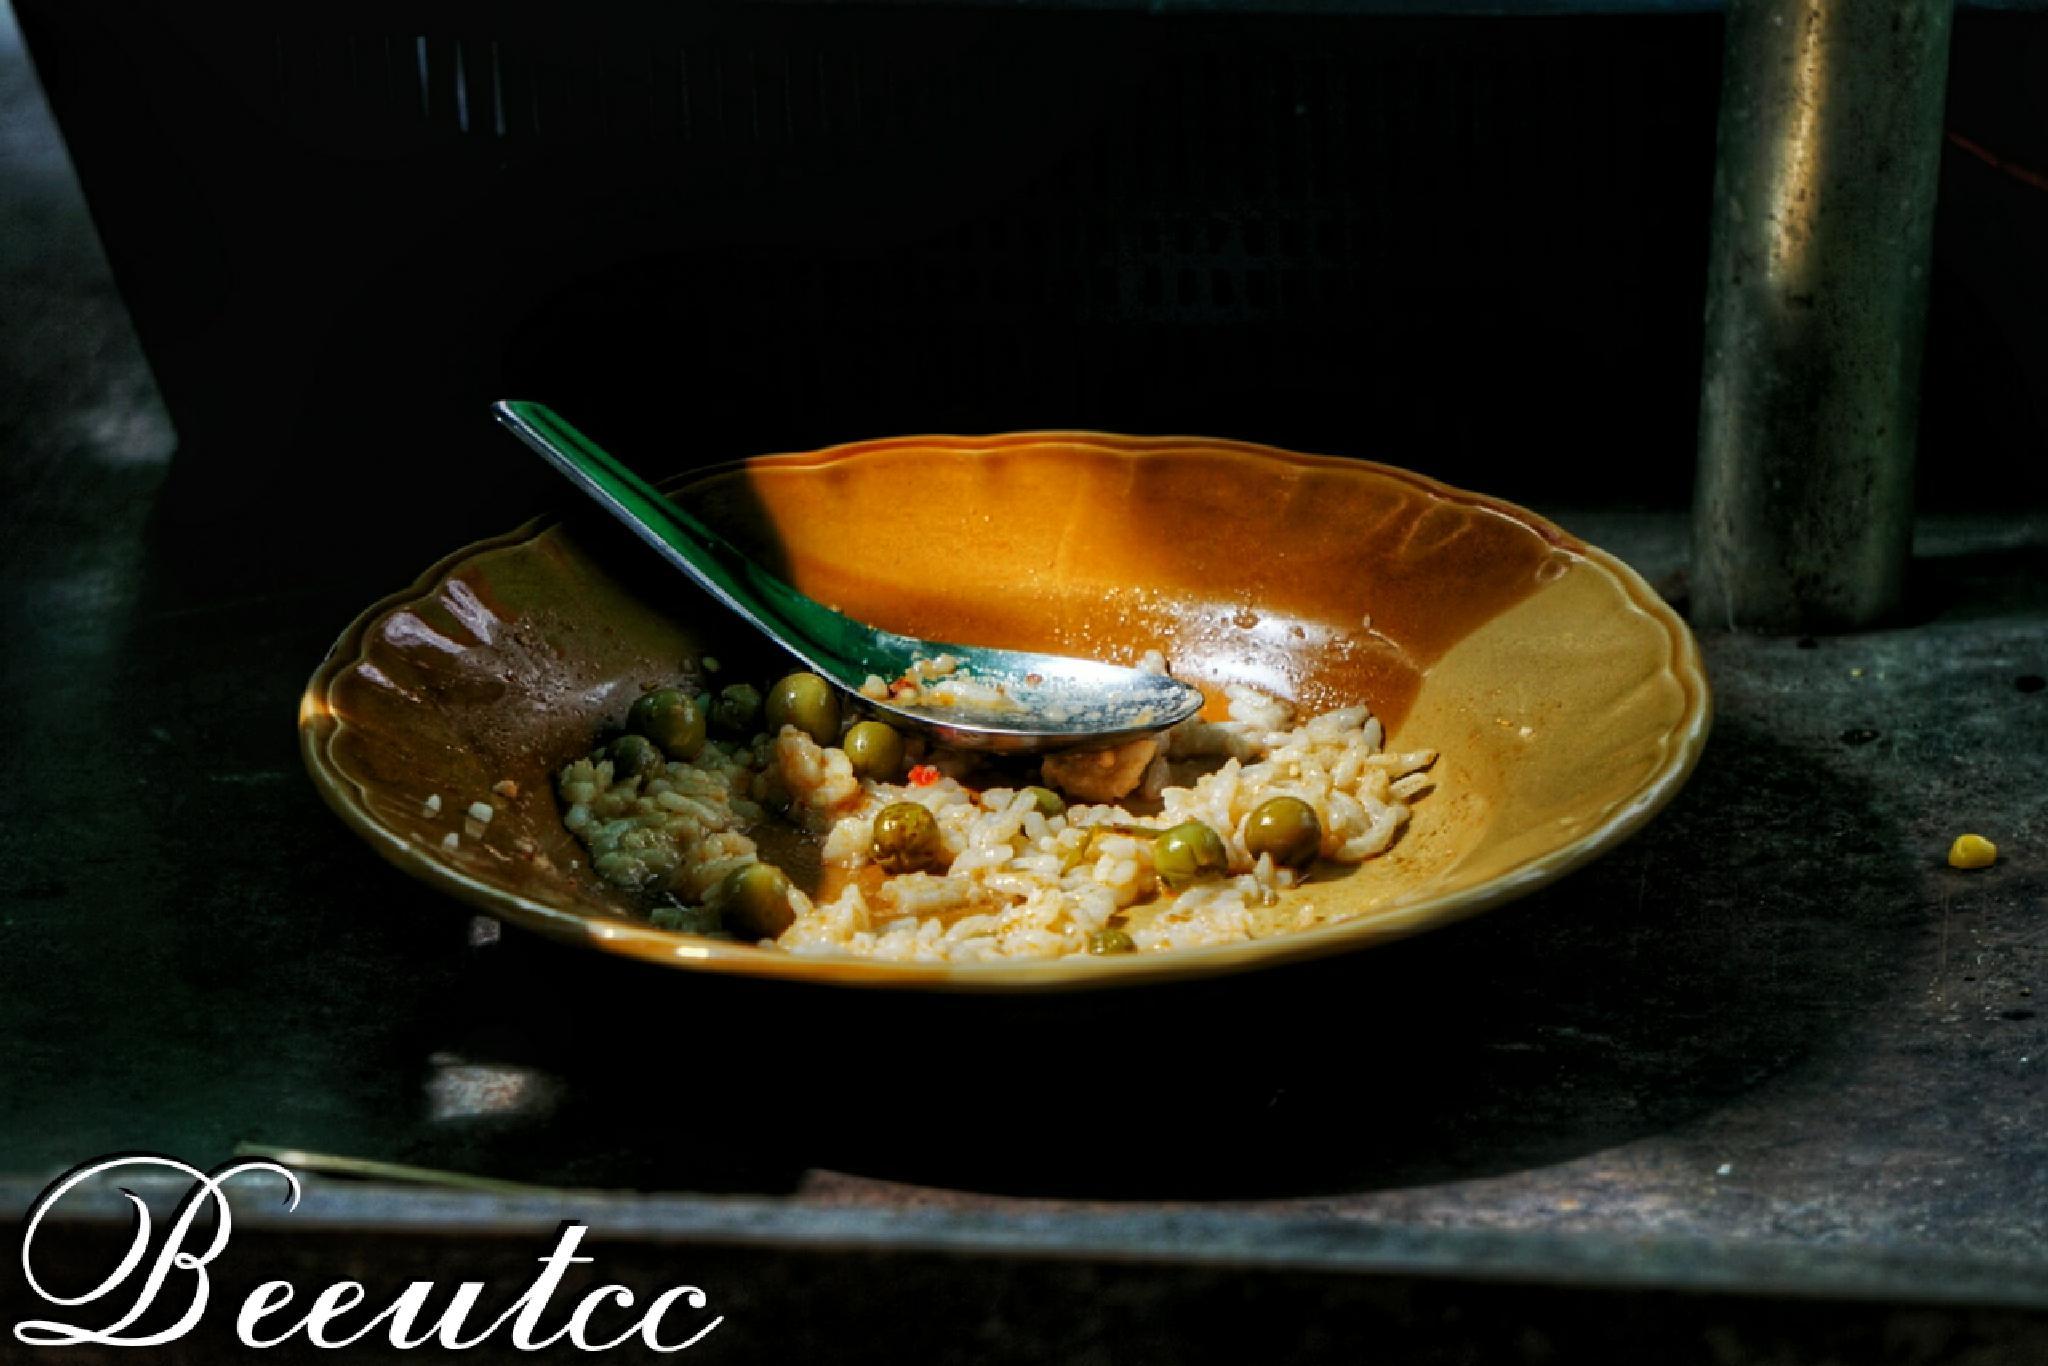 Half eaten meal by Natthawut Meesri